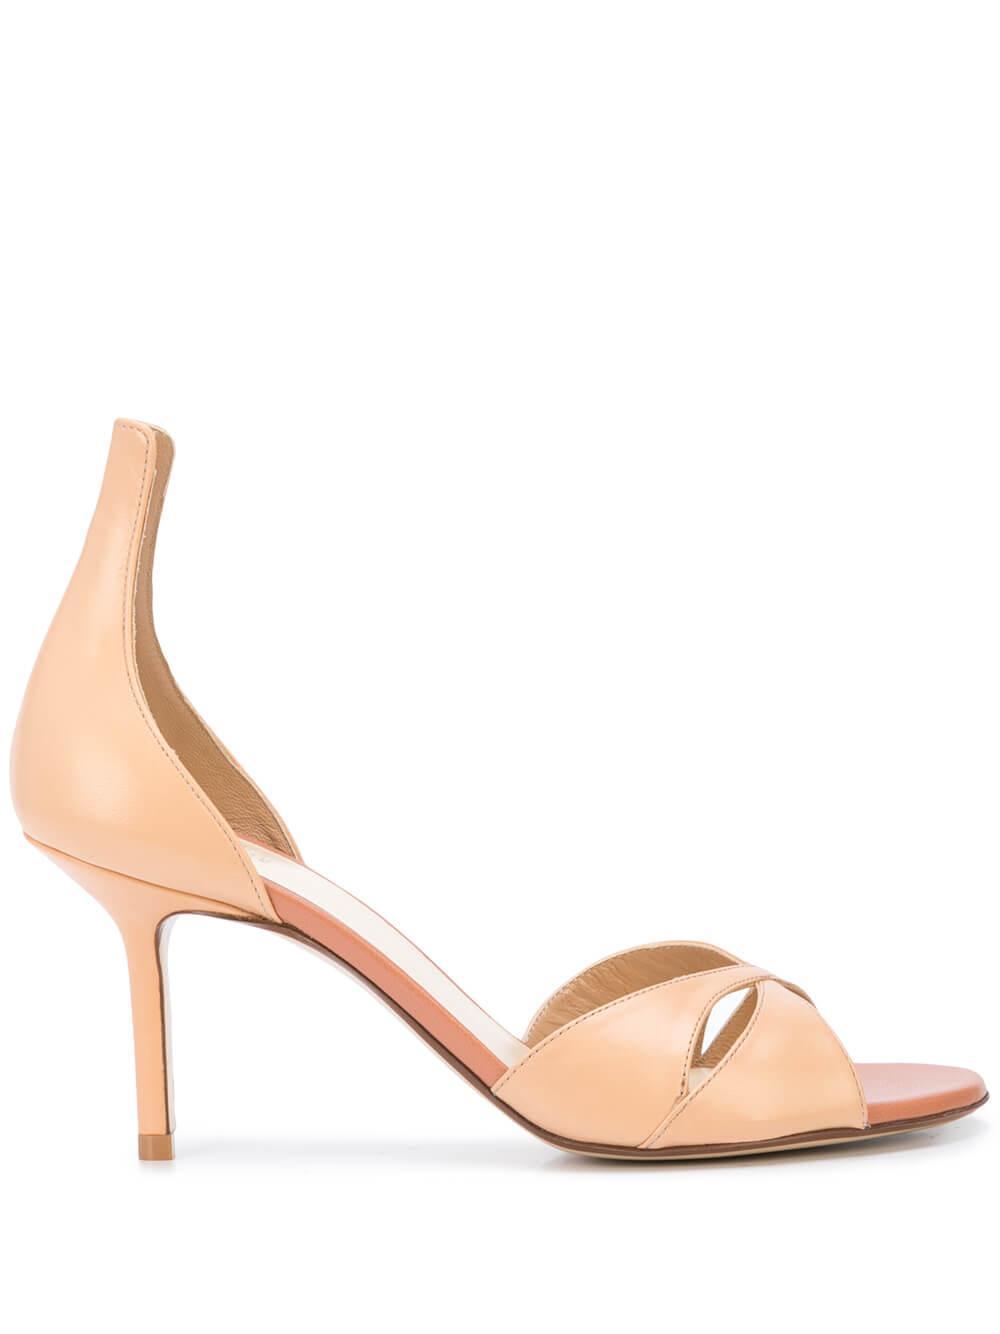 Leather 75mm Criss Cross High Heel Sandal Item # R1S589-200